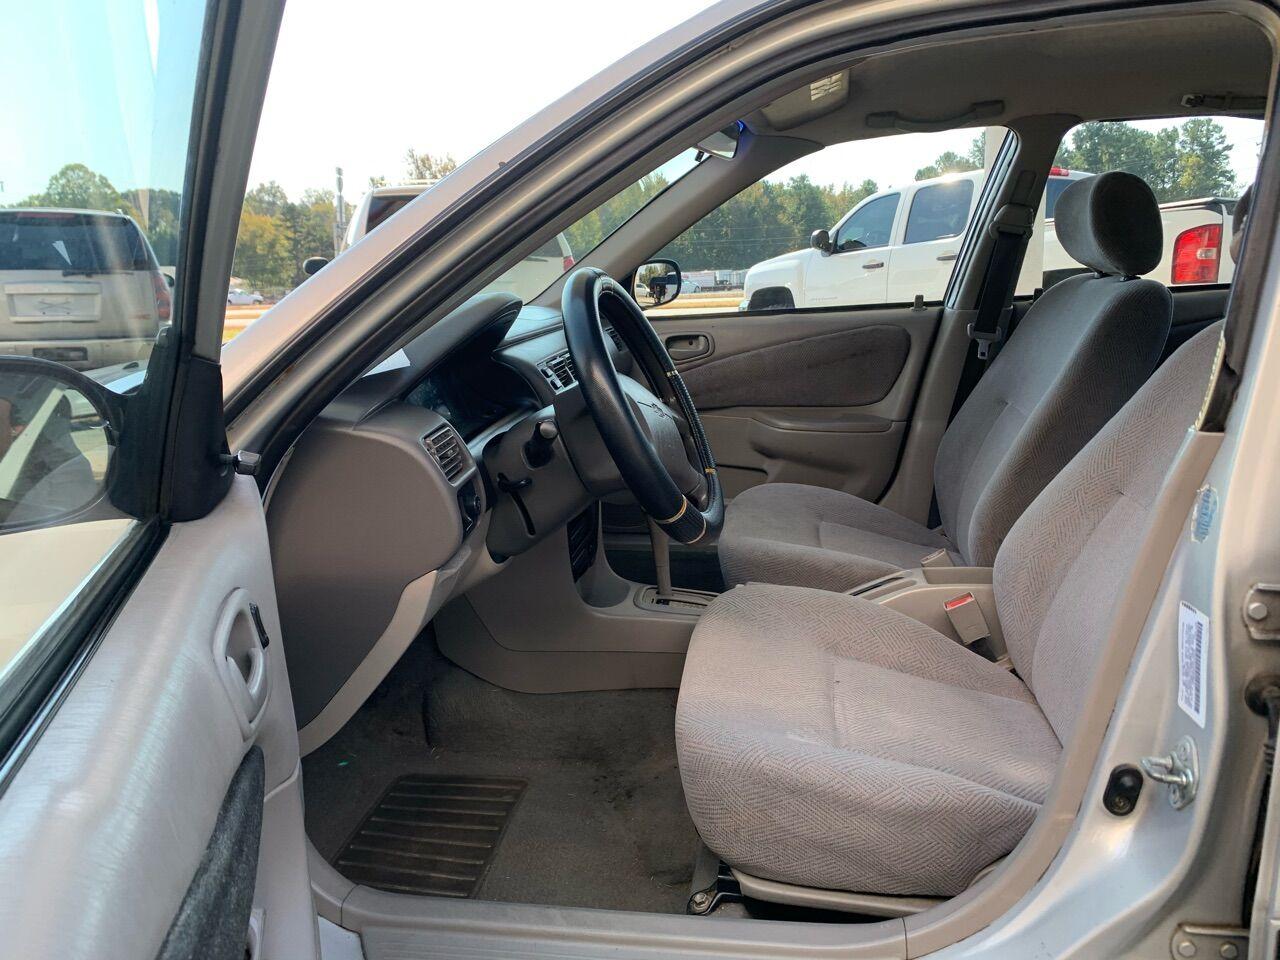 ChevroletPrizm10